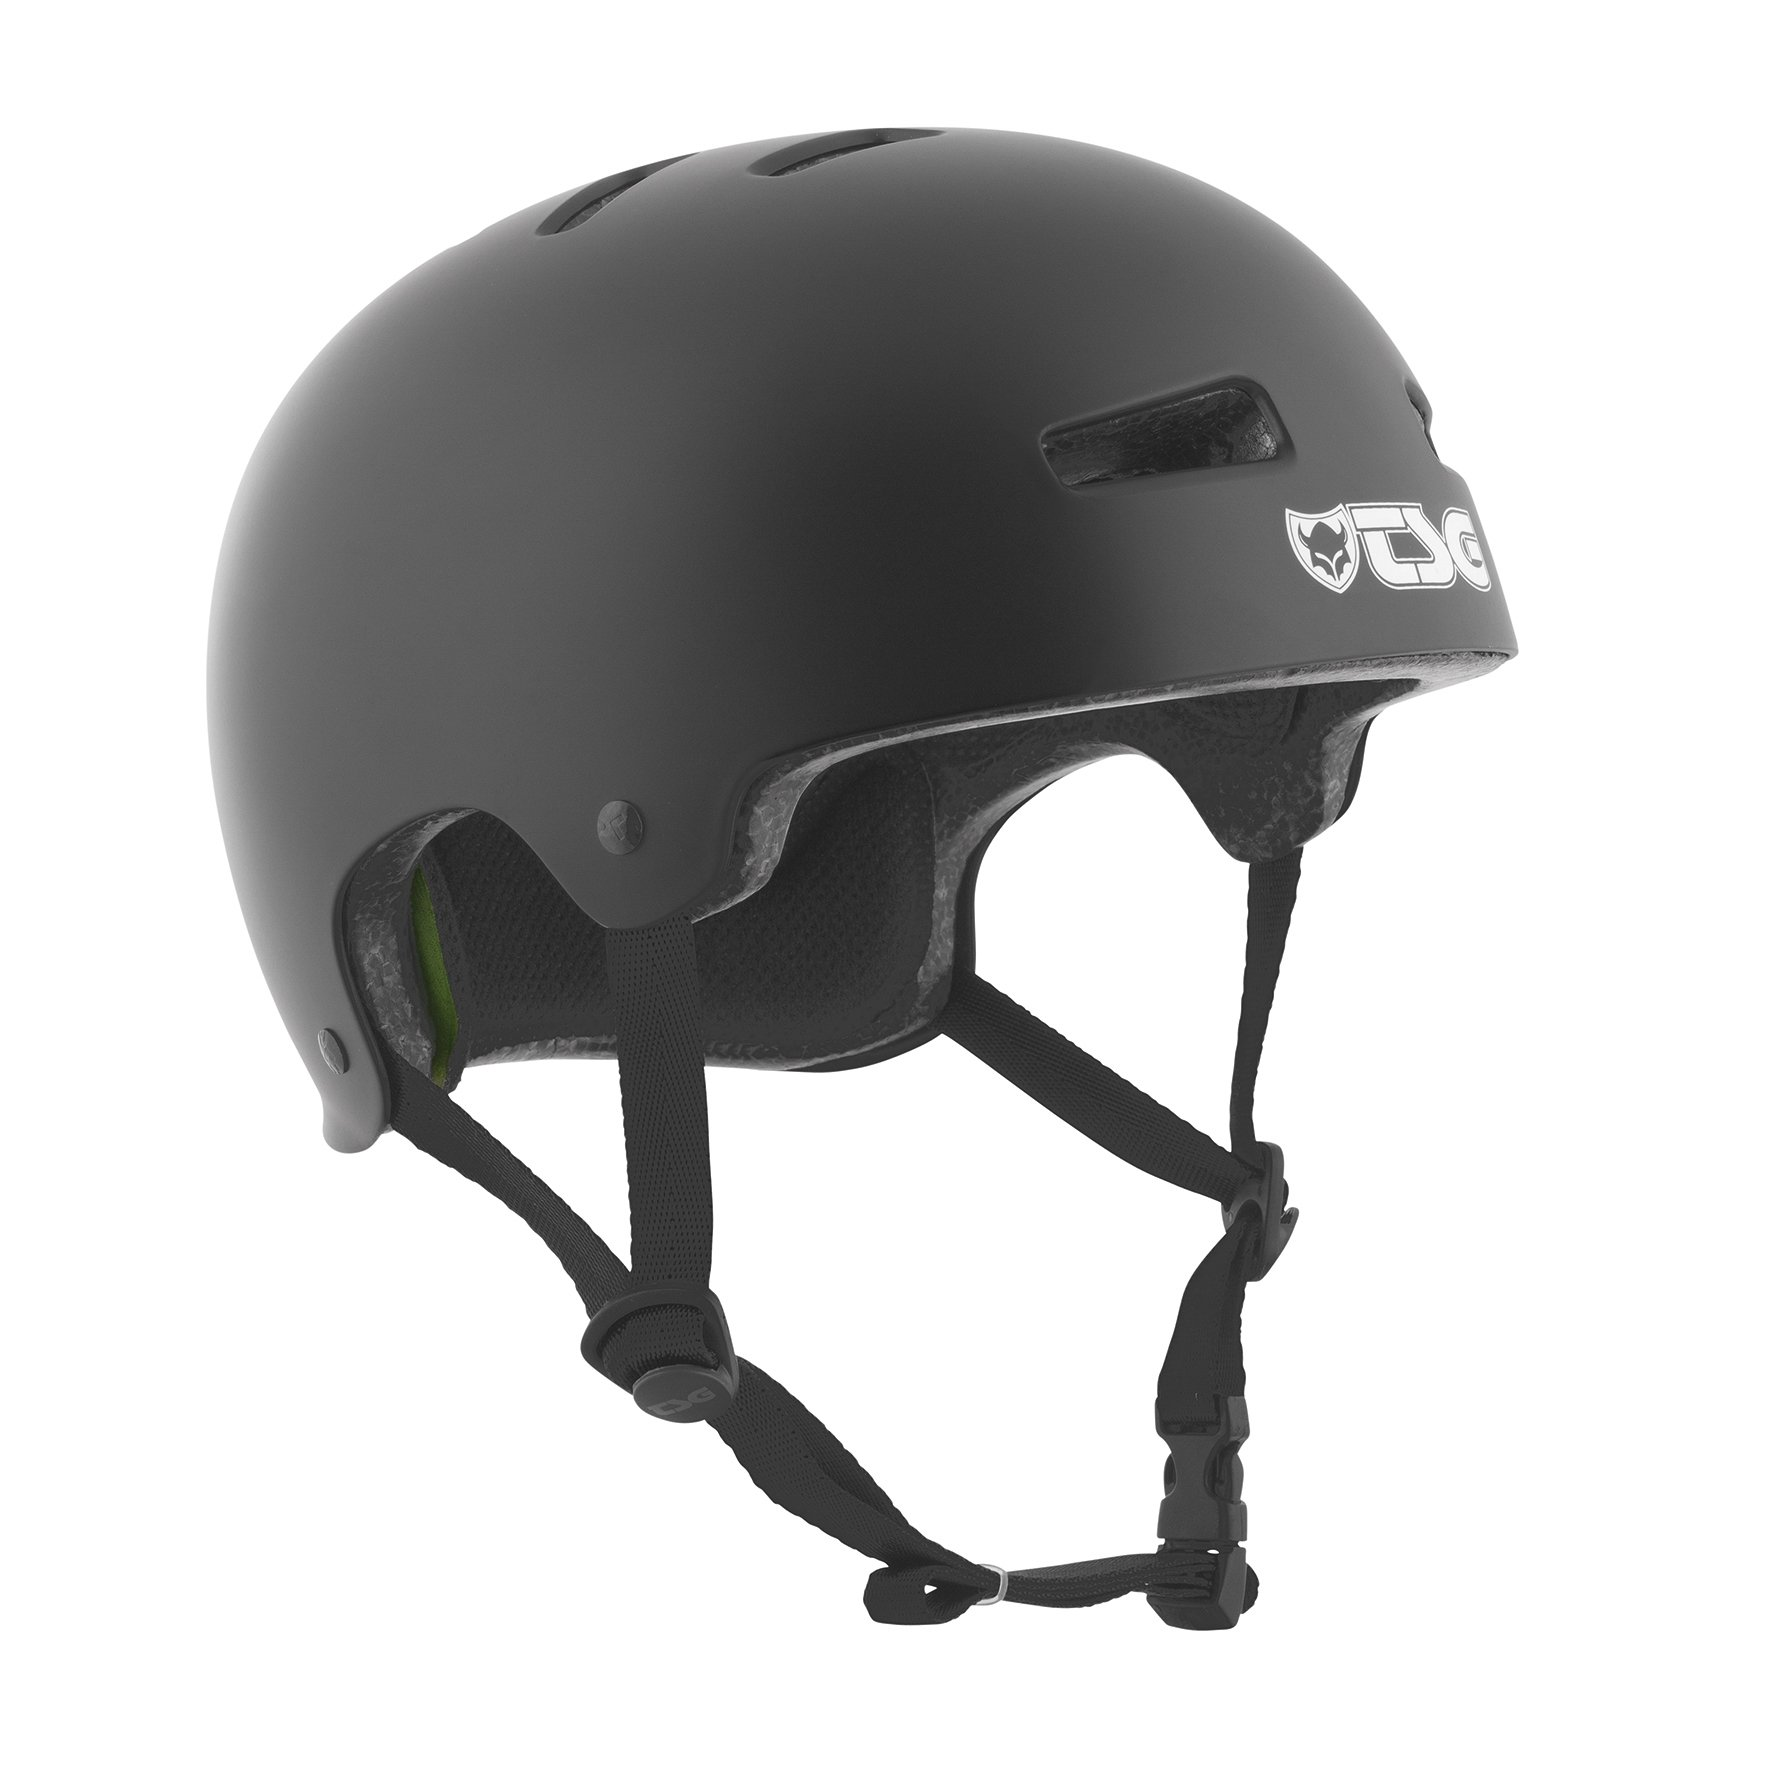 TSG Helmet Evolution Solid Color, Satin Black, S/M, 75046 by Tsg